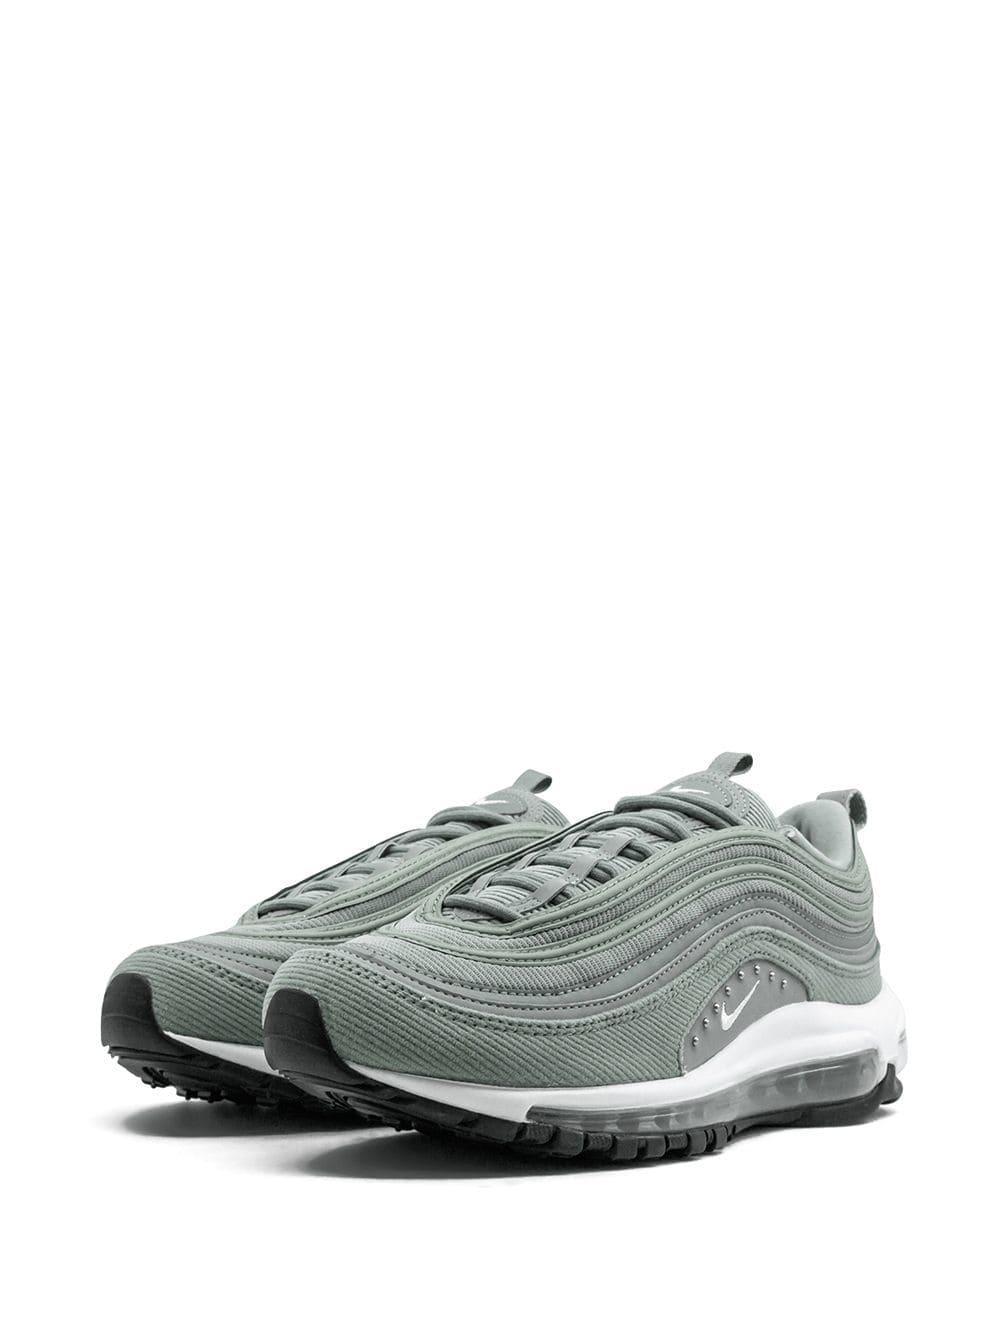 Nike - Green Air Max 97 Se Sneakers - Lyst. View fullscreen 193a0ce18